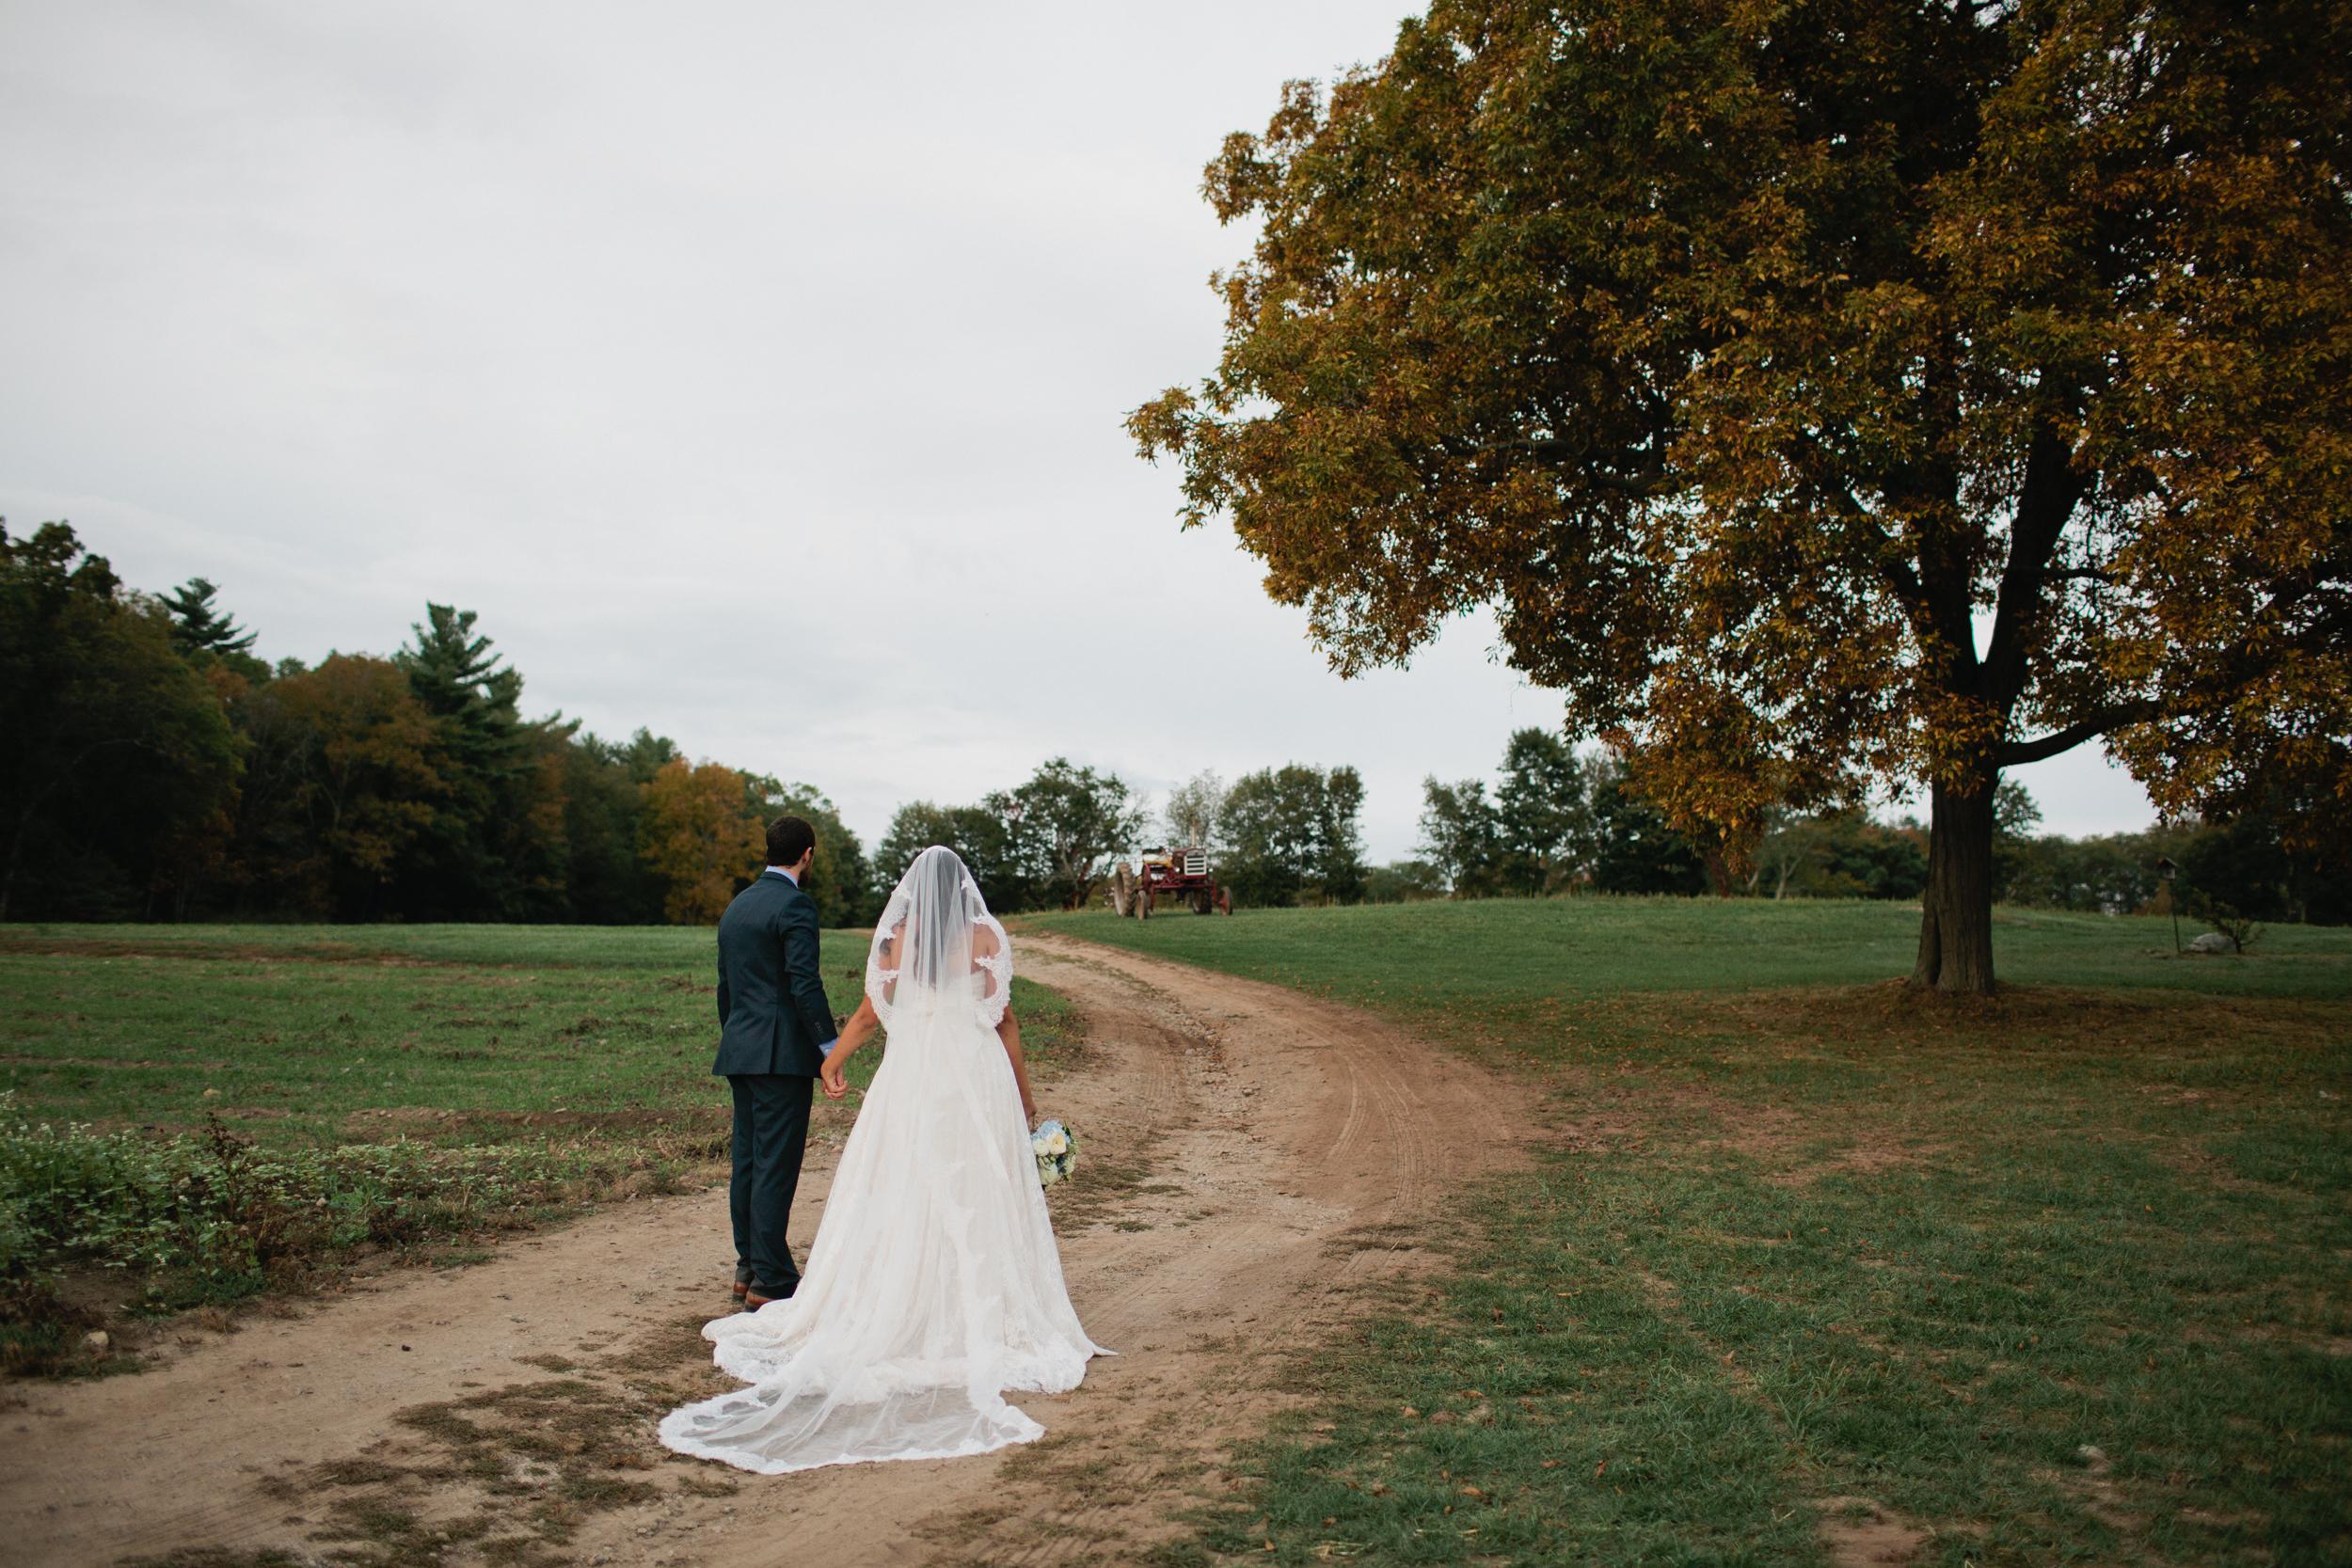 Best-Maine-Wedding-Photographer-1090.jpg